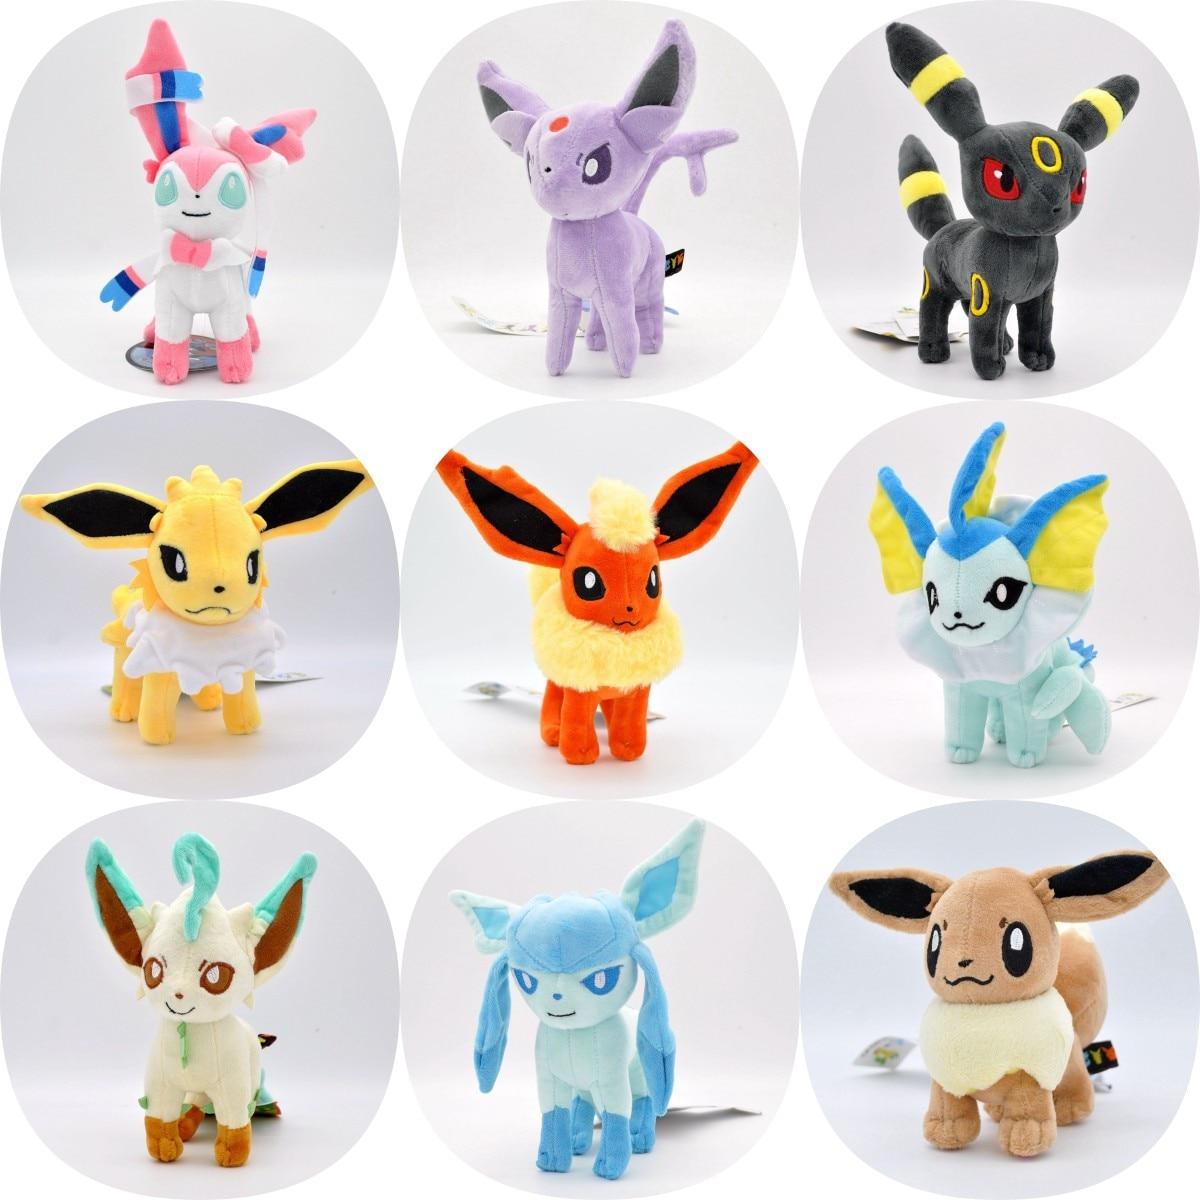 Pokemon Plush 23cm Eevee Sylveon Umbreon Vaporeon Glaceon Espeon Soft Stuffed Doll